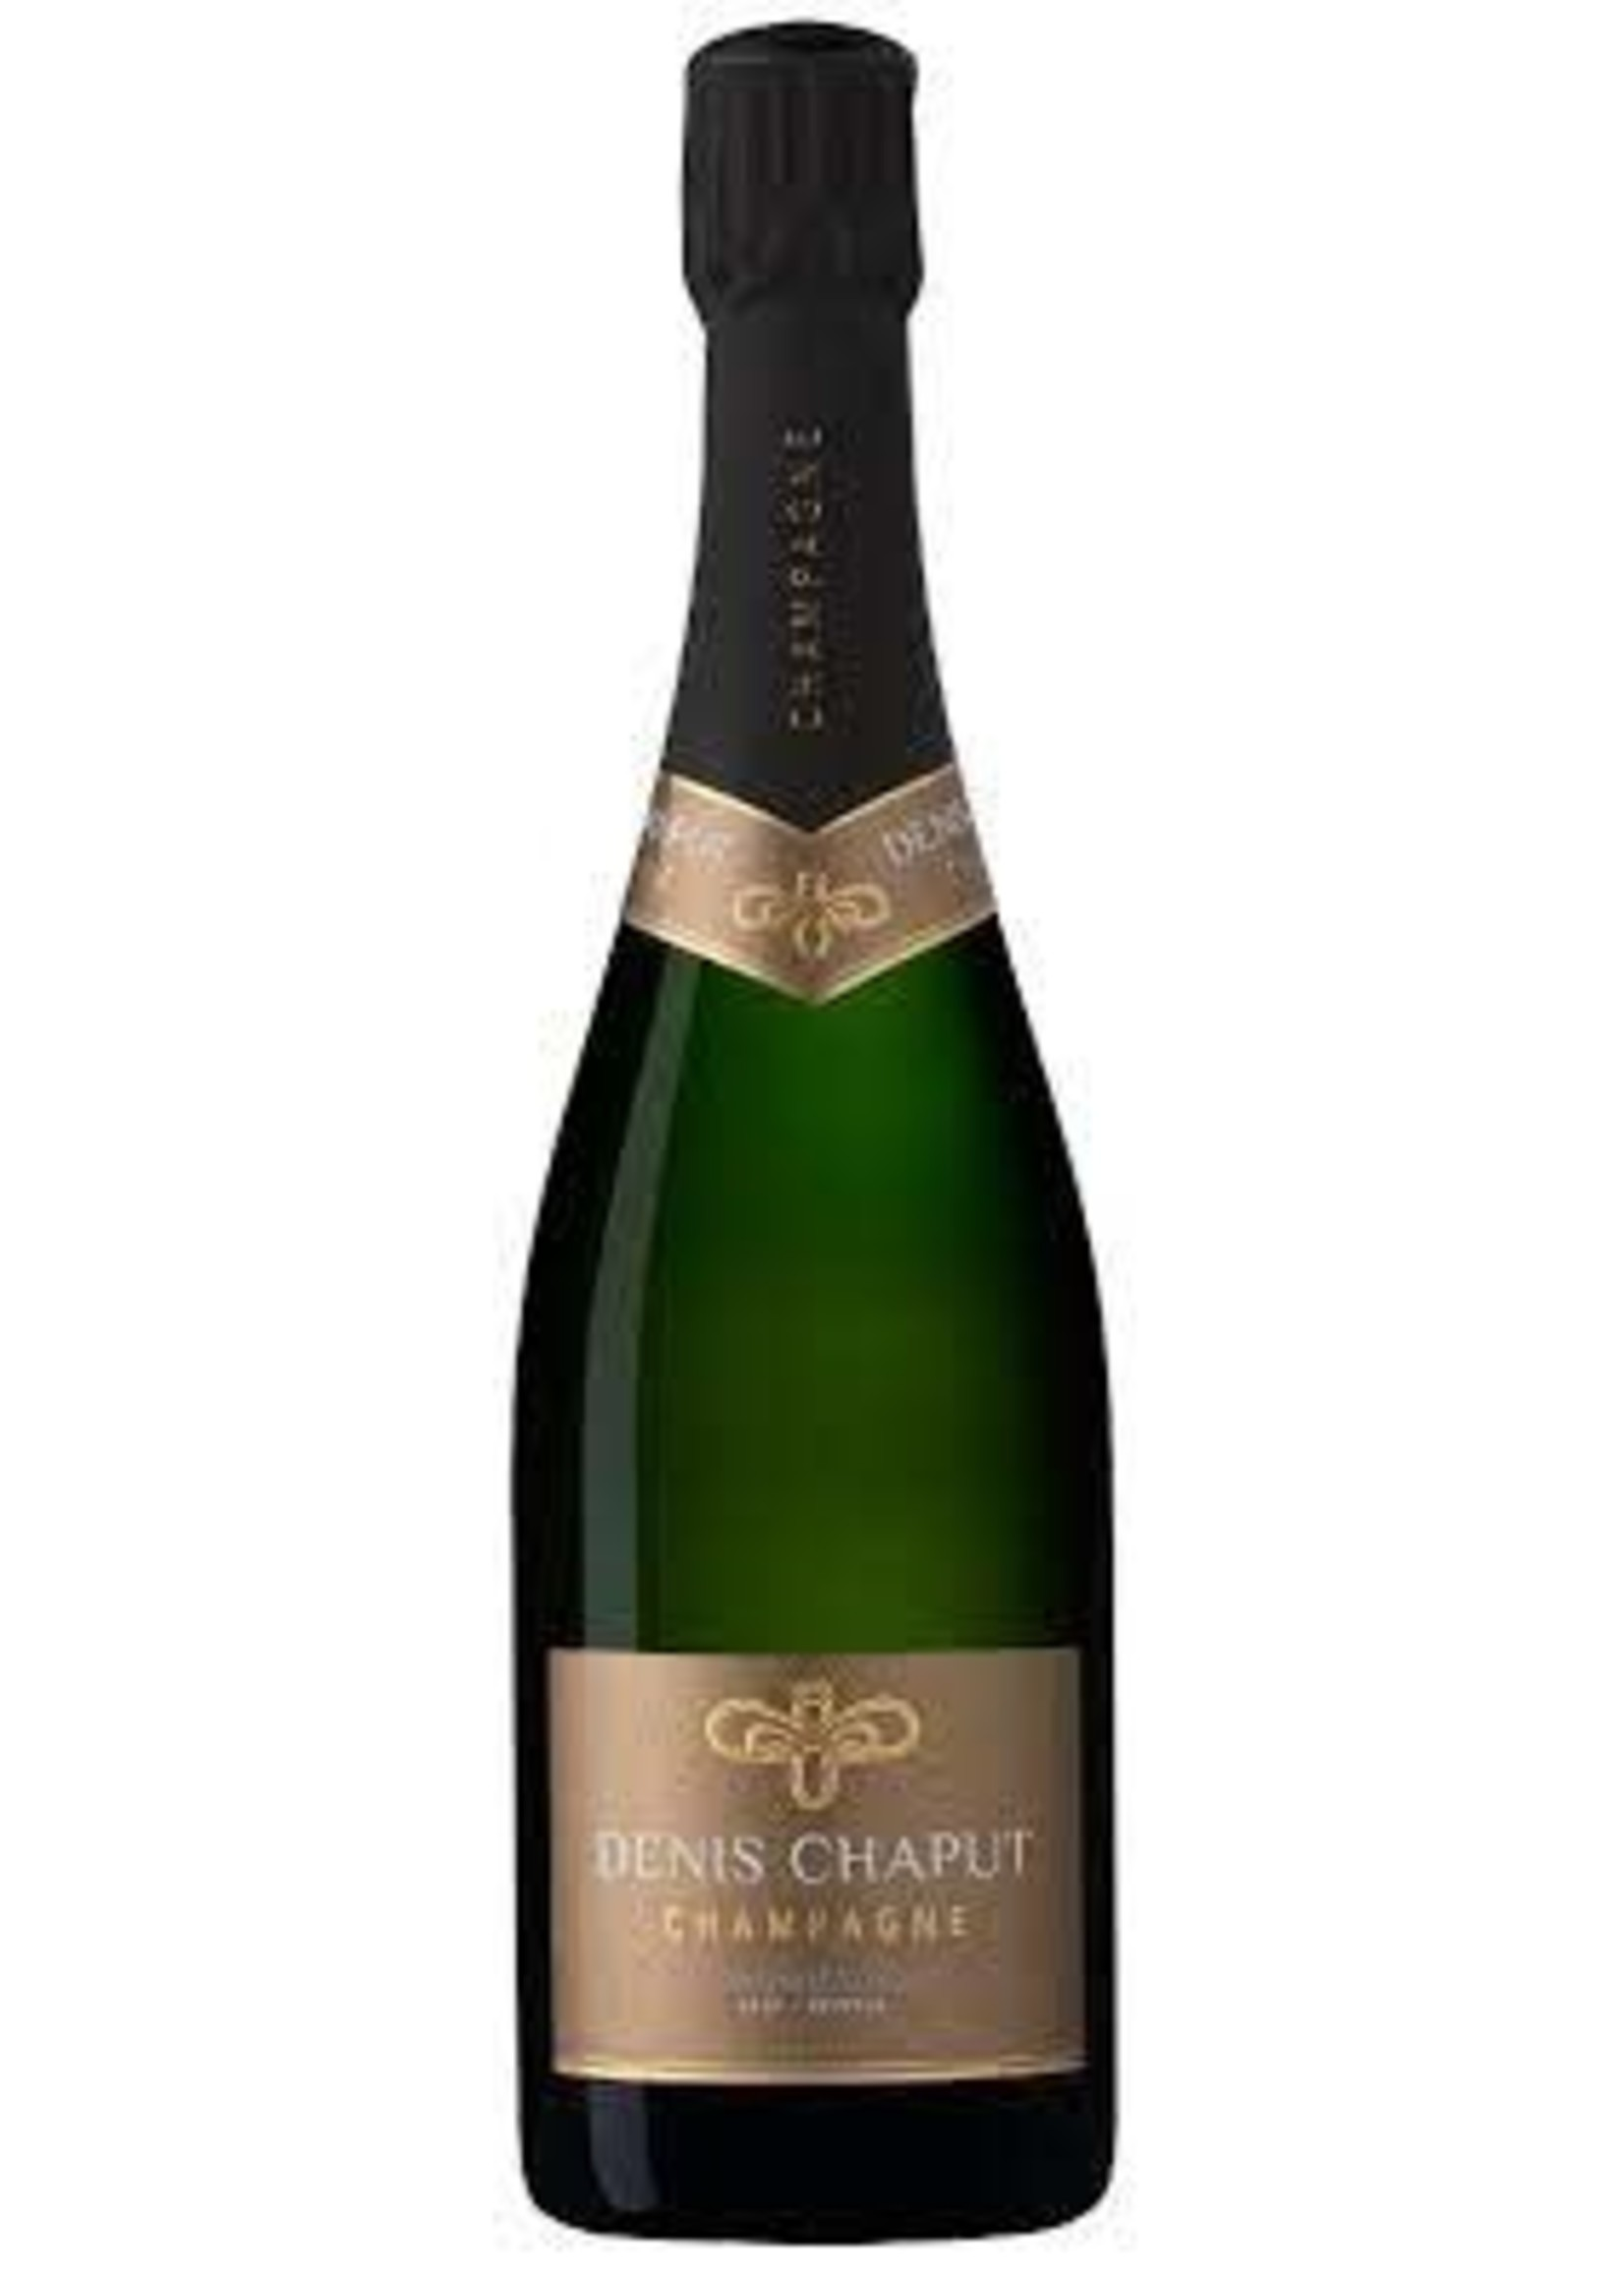 Denis Chaput Champagne NV Reserve Brut L'Ombre d'Armand 750ml